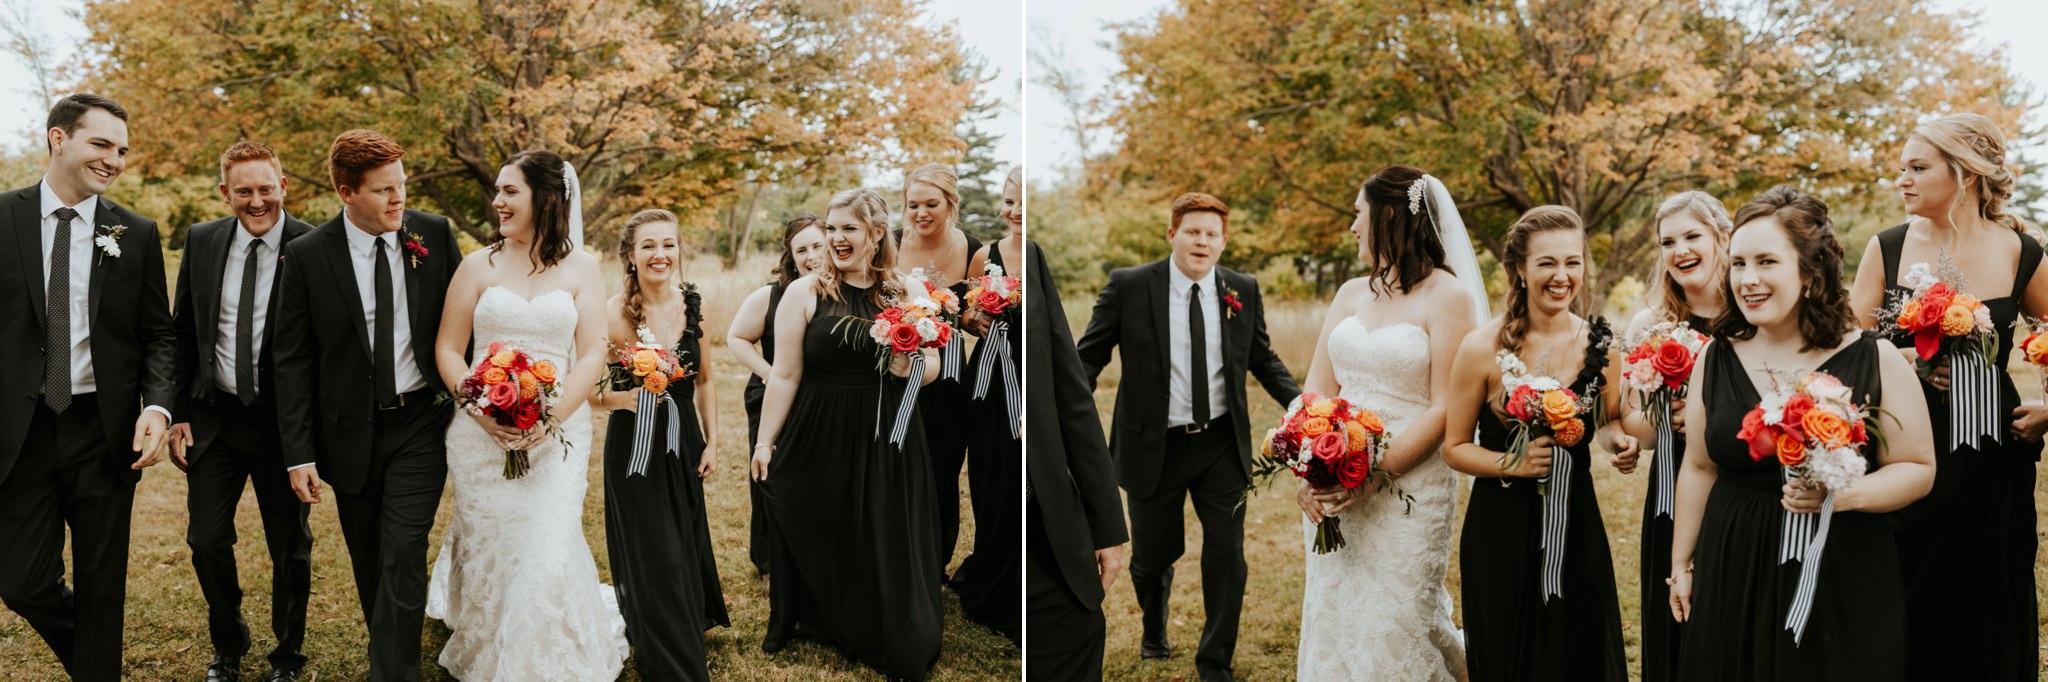 17-09-15 Lindsey and Brandon Wedding Edited-530_WEB.jpg